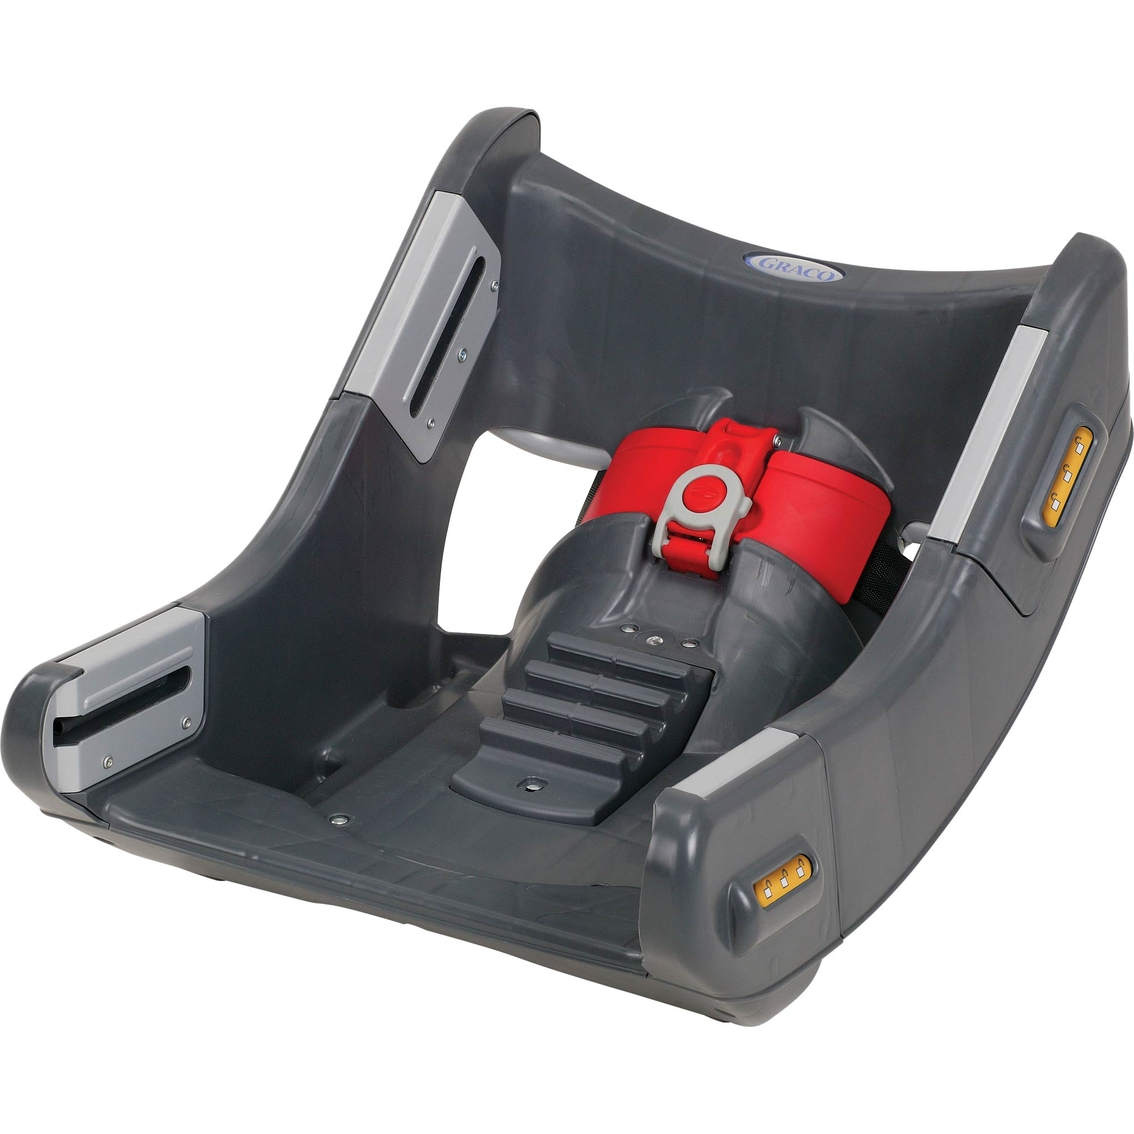 Sparkling Graco Seat Car Seat Base Graco Seat Car Seat Base Convertible Seats Baby Graco Seat Convert To Booster Graco Seat Instructions baby Graco Smart Seat